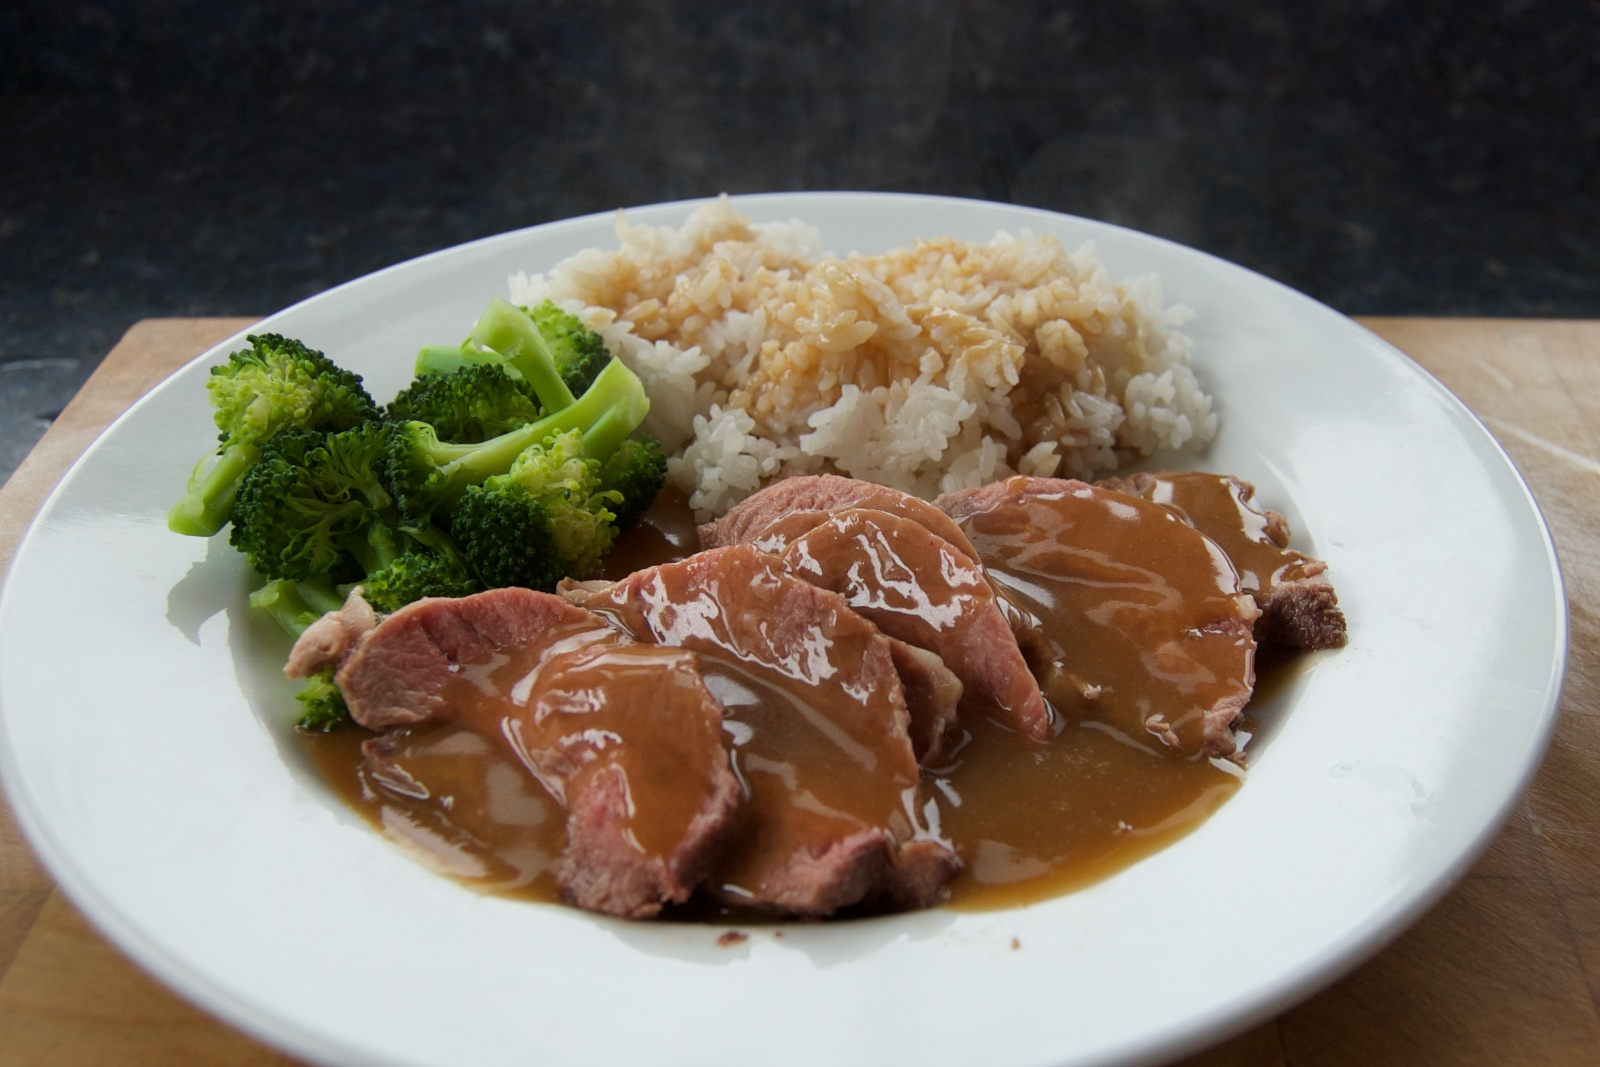 http://blog.rickk.com/food/2018/03/15/ate.2018.03.14.d.jpg